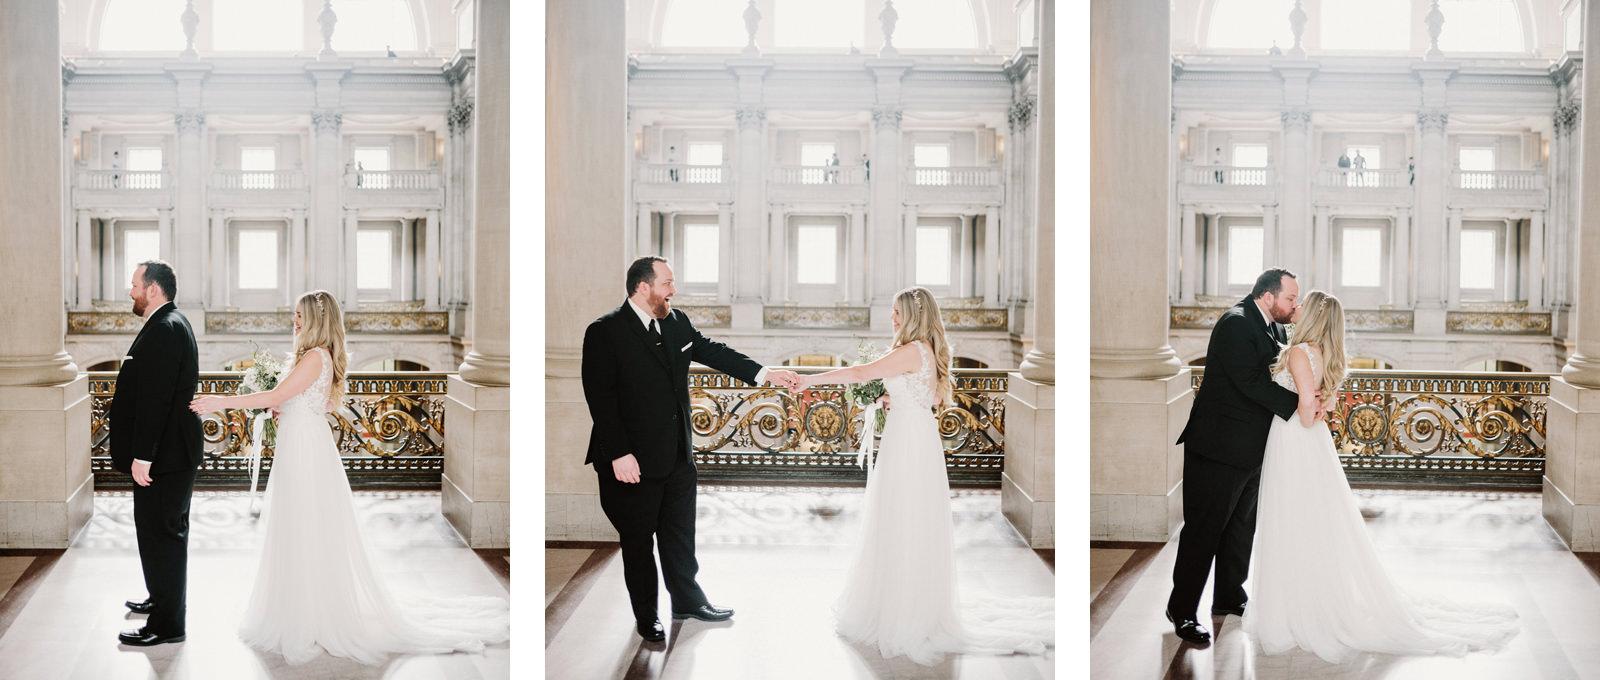 san-francisco-city-hall-elopement-05 SAN FRANCISCO CITY HALL INTIMATE WEDDING